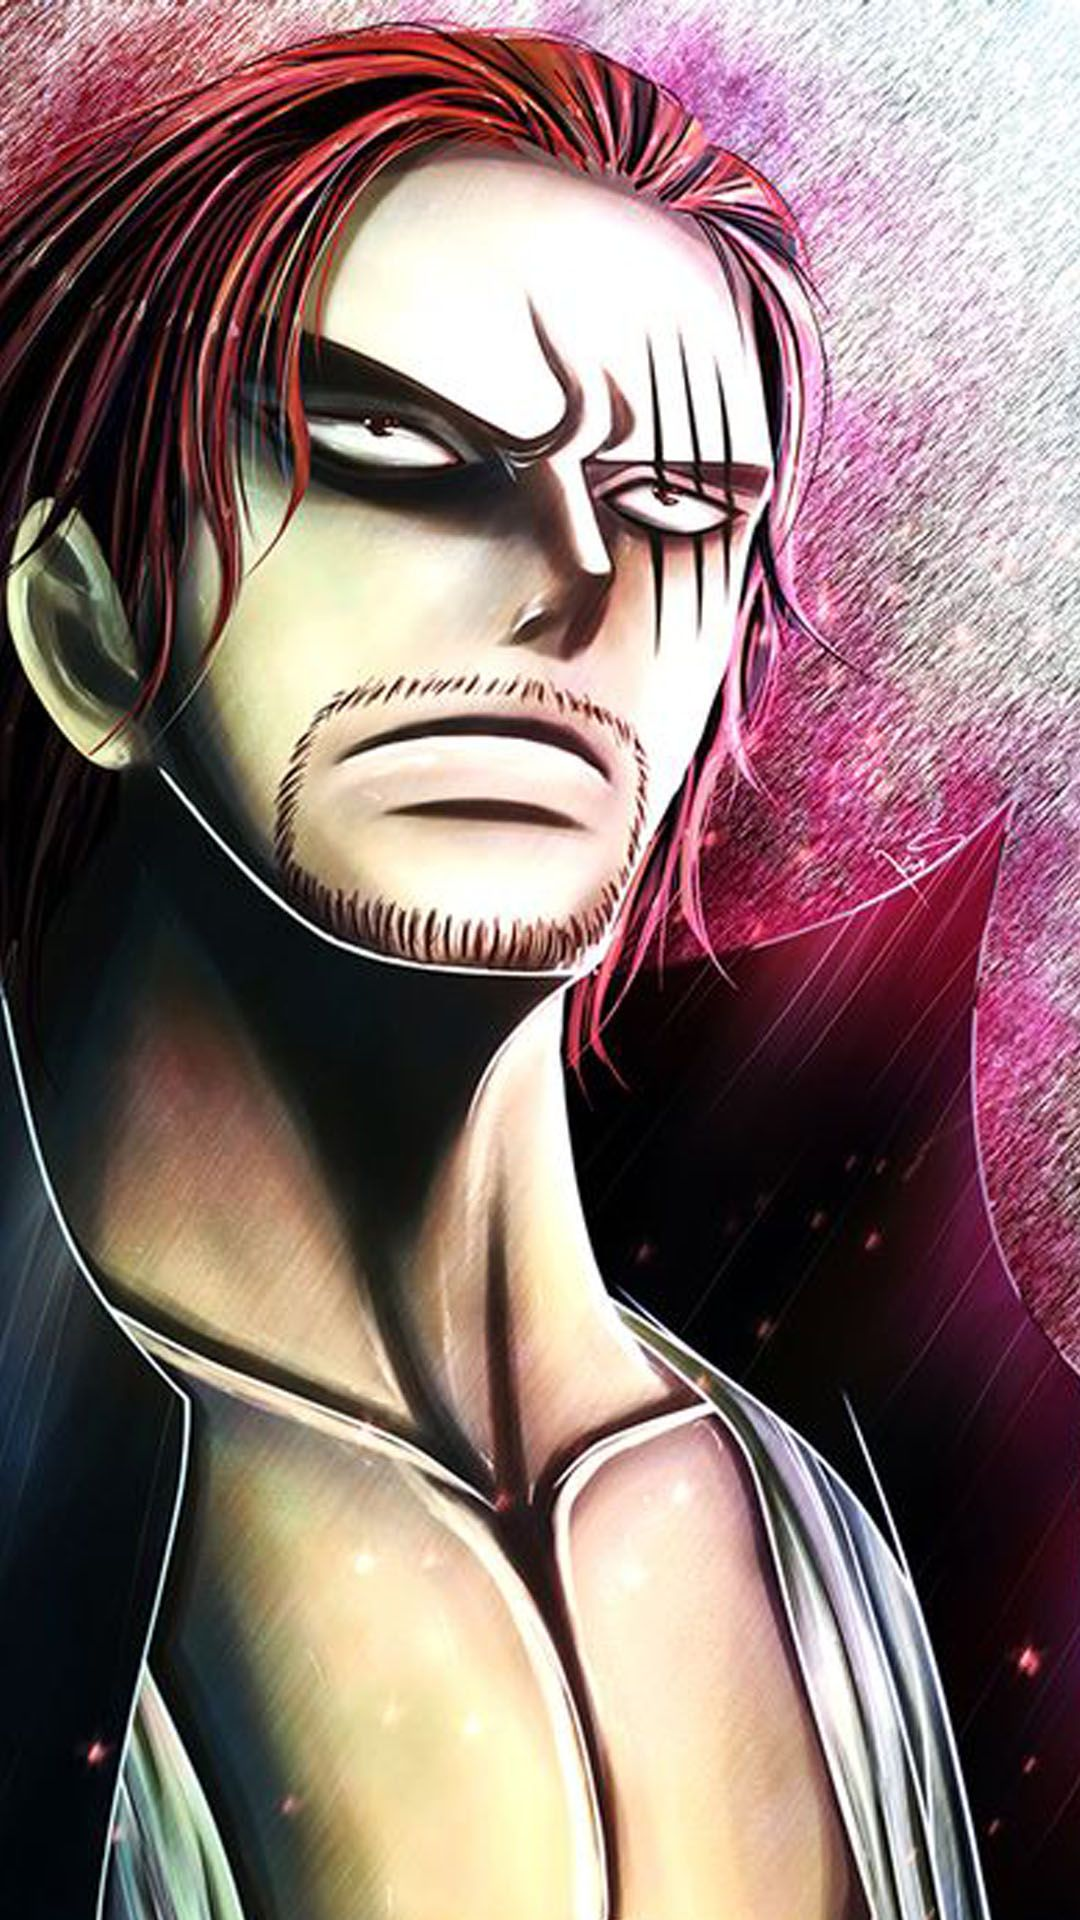 Anime Wallpaper Hd Wallpaper One Piece Shanks Hd